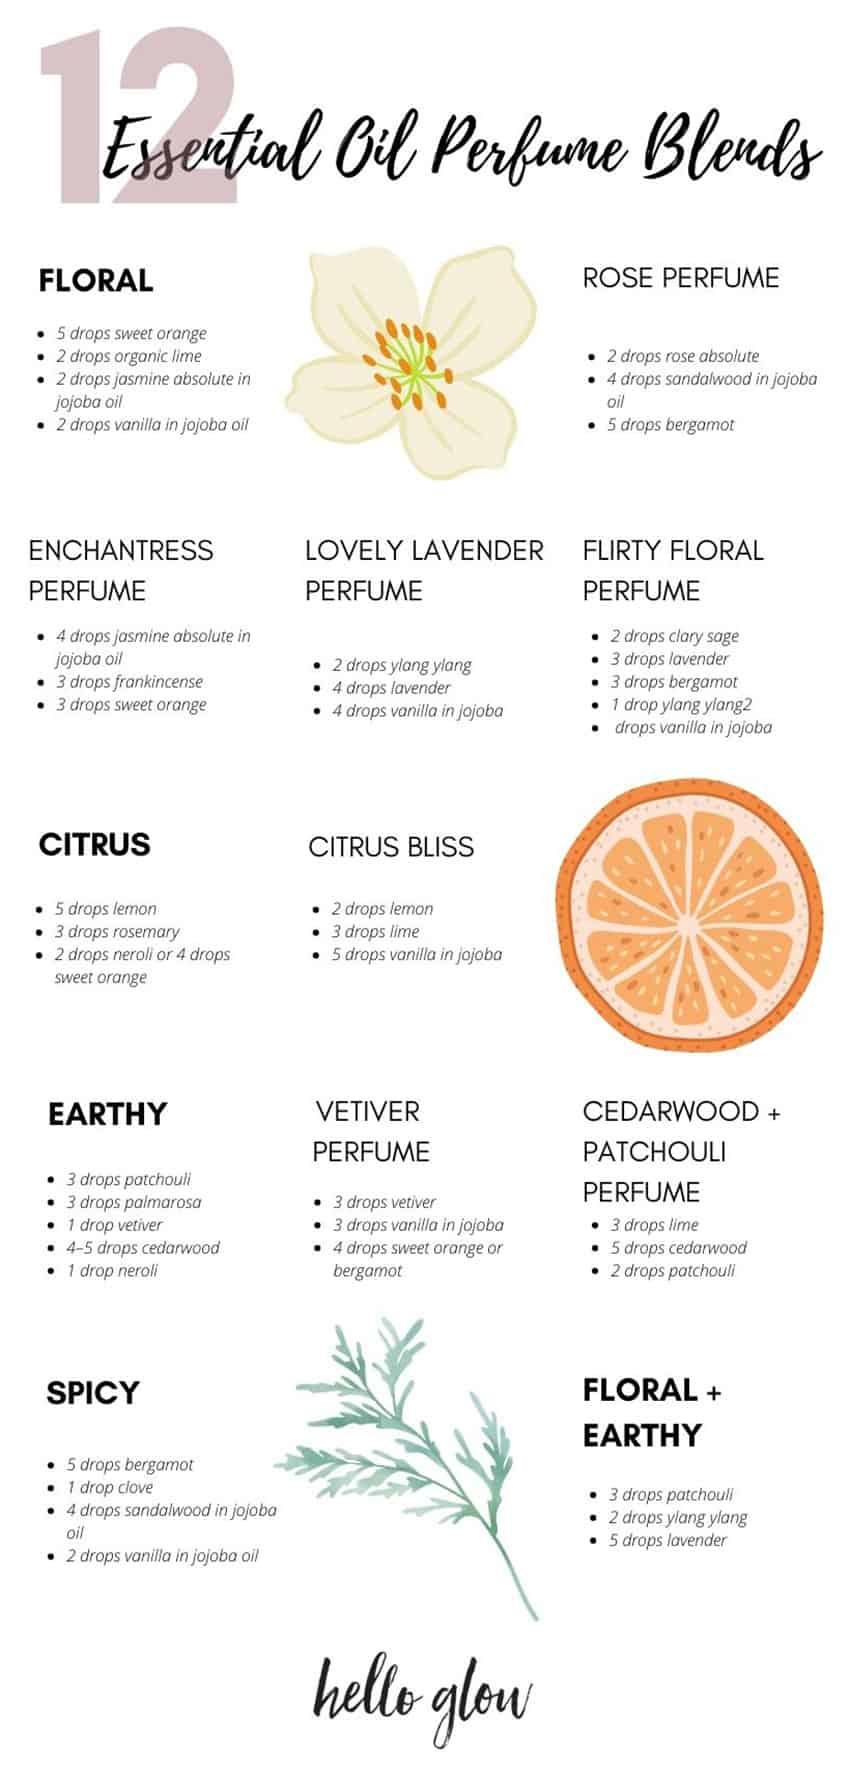 12 Essential Oil Perfume Blends